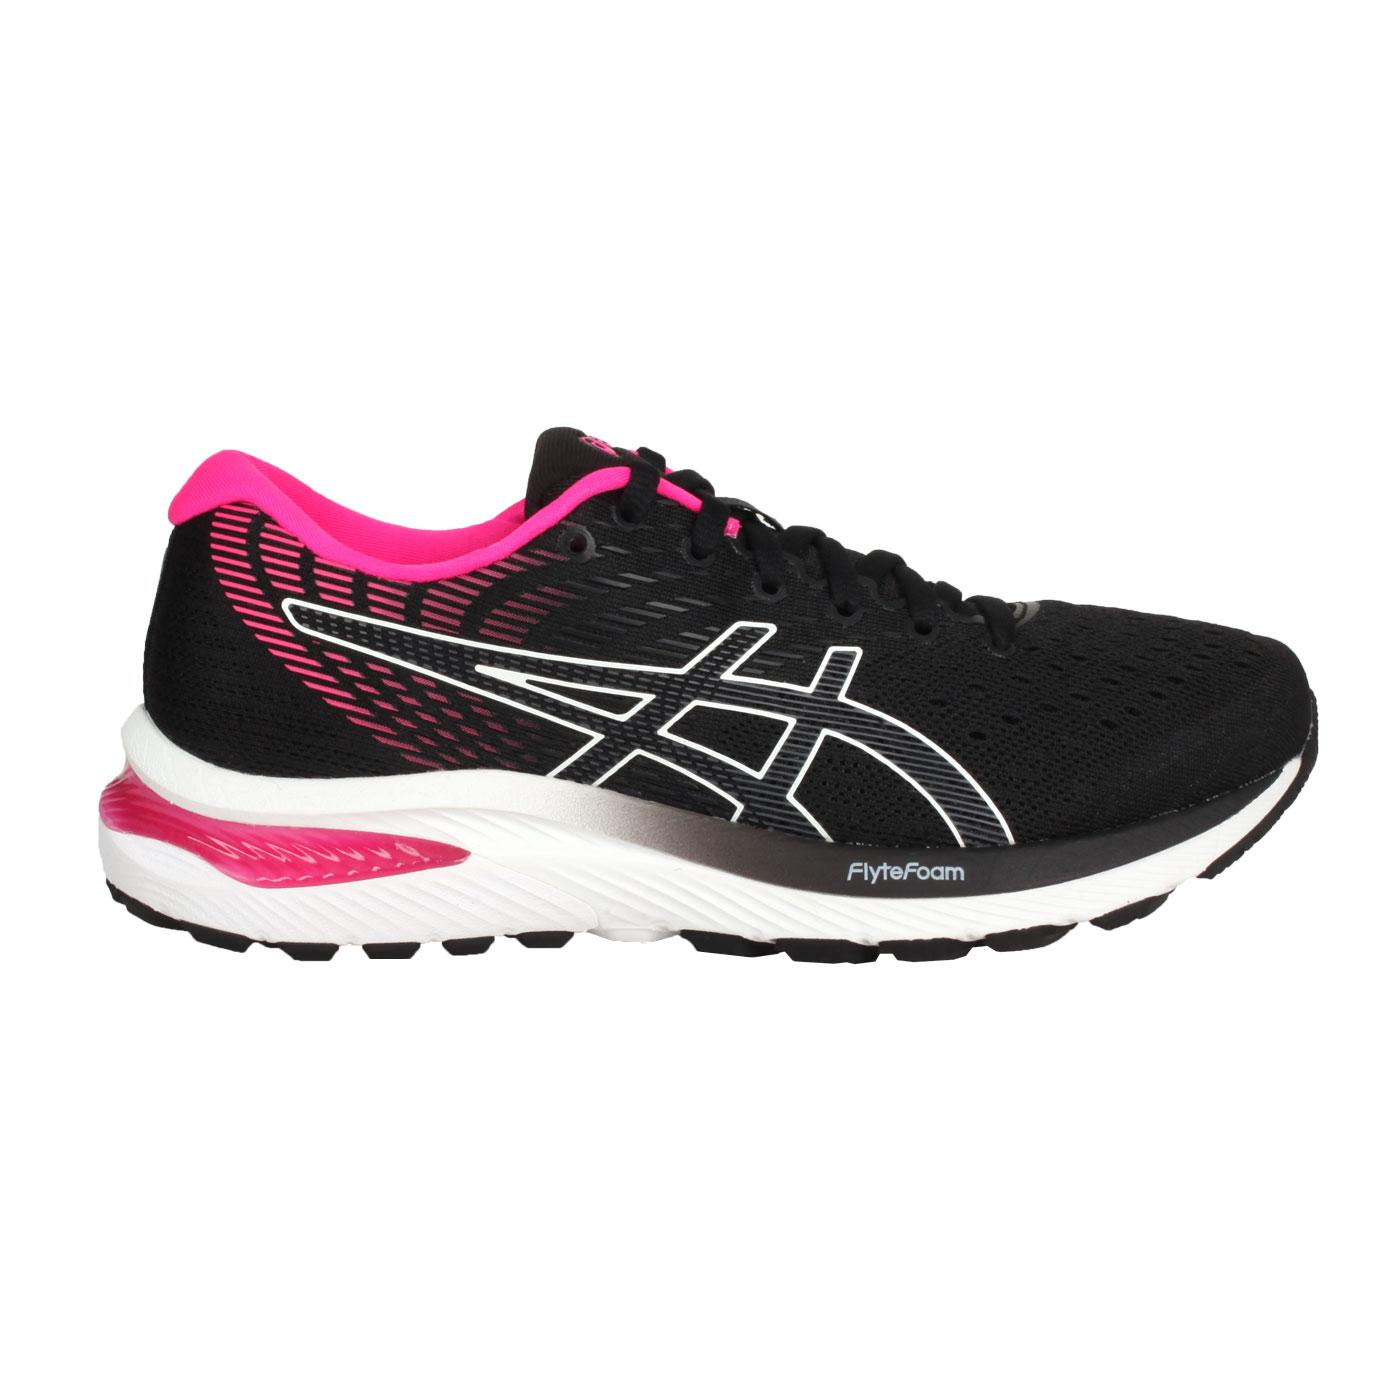 ASICS 女款慢跑鞋-WIDE  @GEL-CUMULUS 22@1012A738-001 - 黑白桃紅